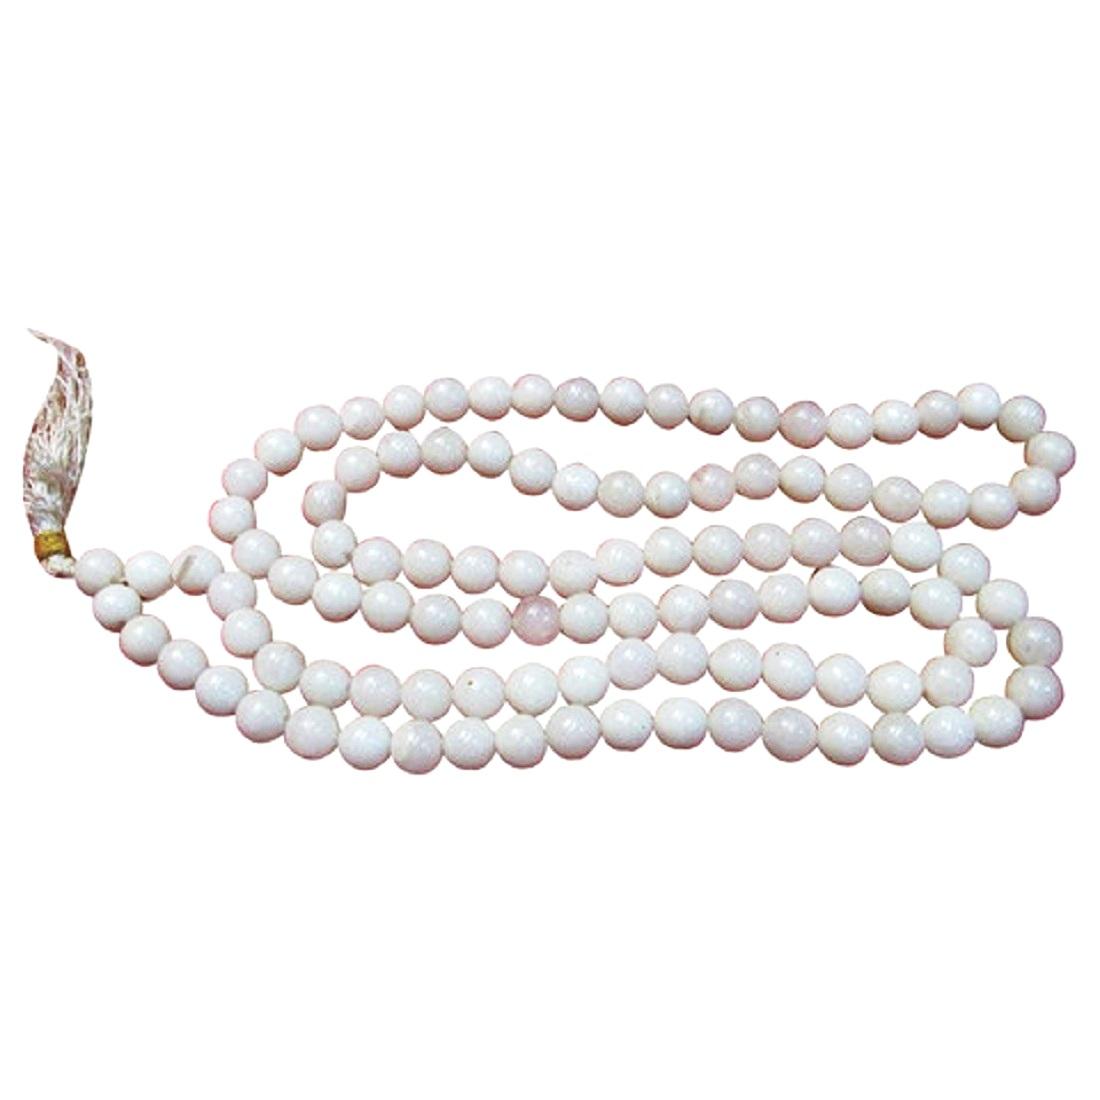 Numeroastro White Agate | Hakik Round Beads Hand Knotted Mala (109 Beads) (1 Pc)